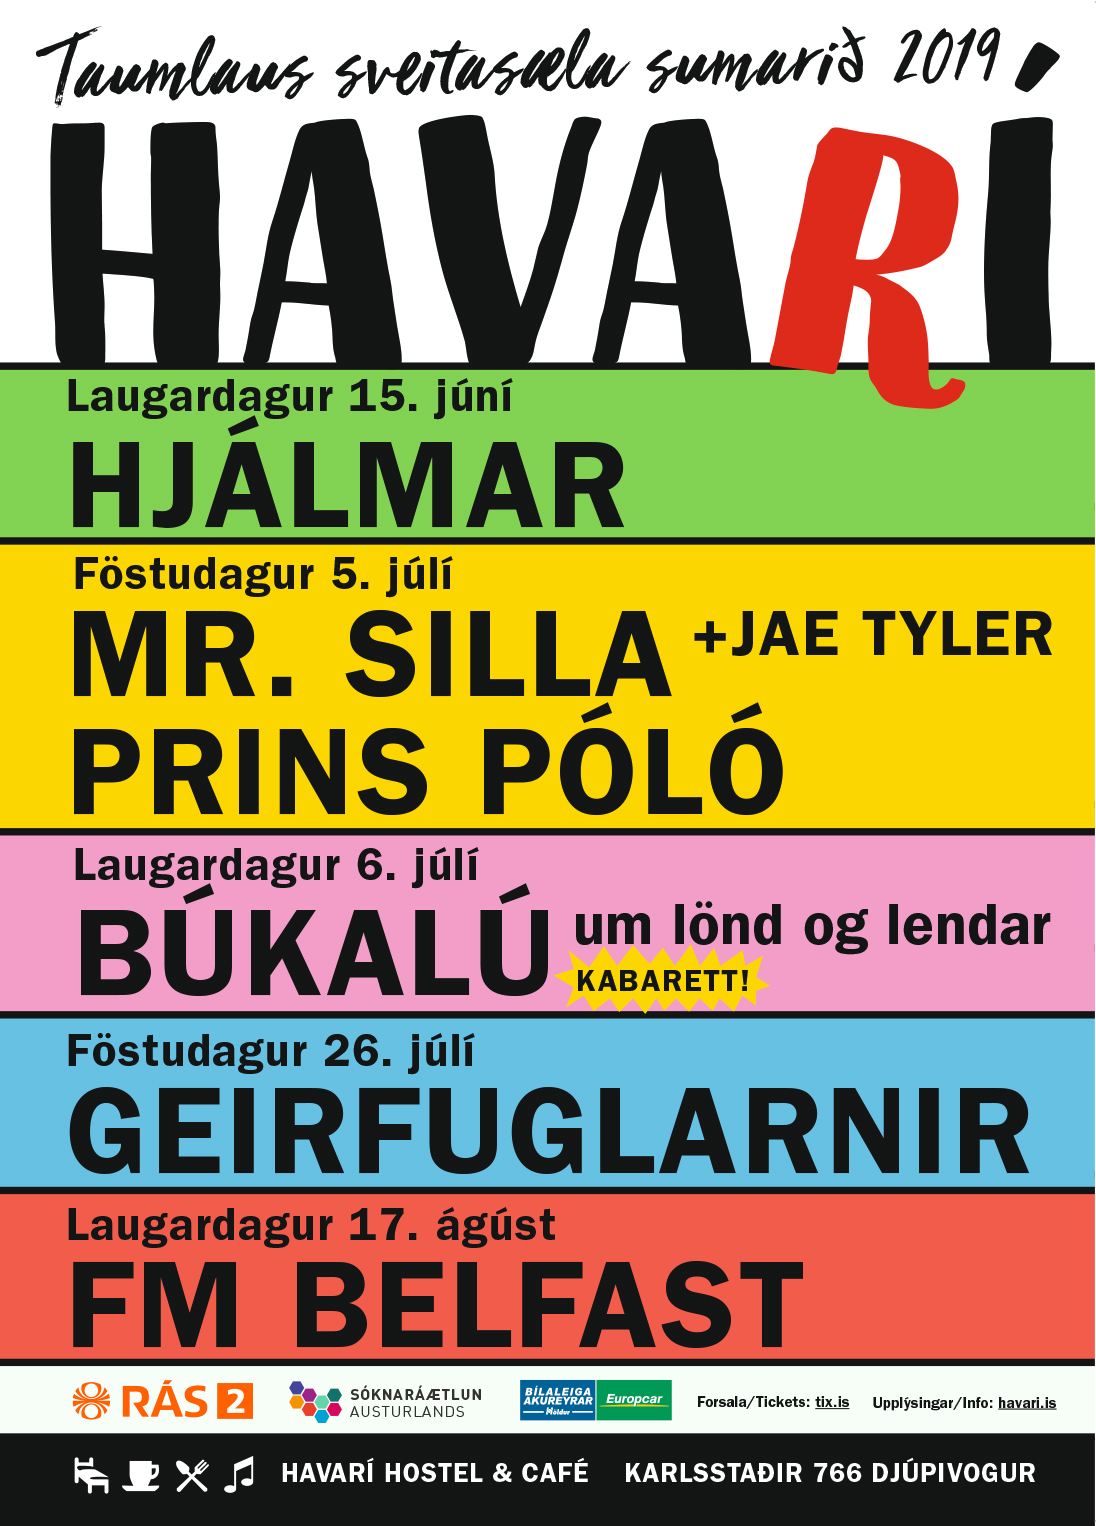 Sumari-i-havari-2019-poster-A3---4.jpg